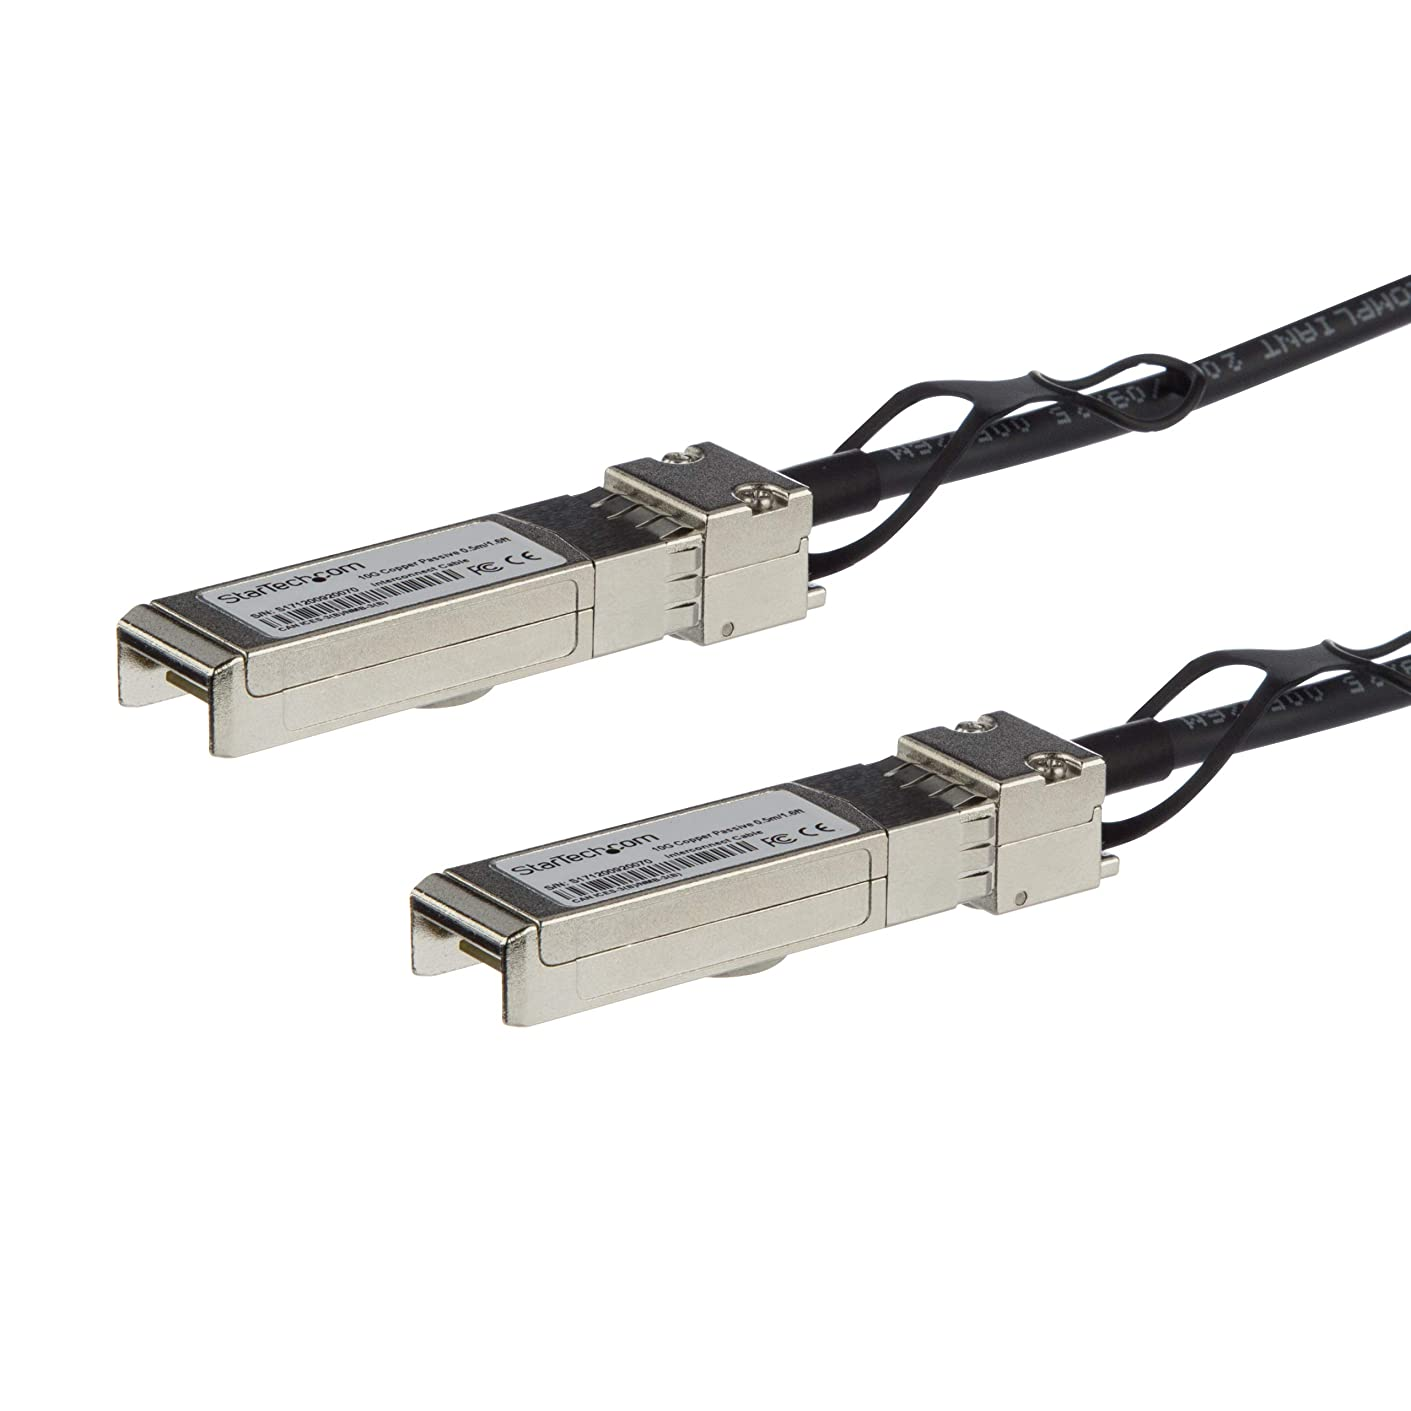 StarTech.com SFP+ DAC Twinax ケーブル MSA準拠 1m 10GbE パッシブダイレクトアタッチケーブル Mini-GBICケーブル SFP10GPC1M